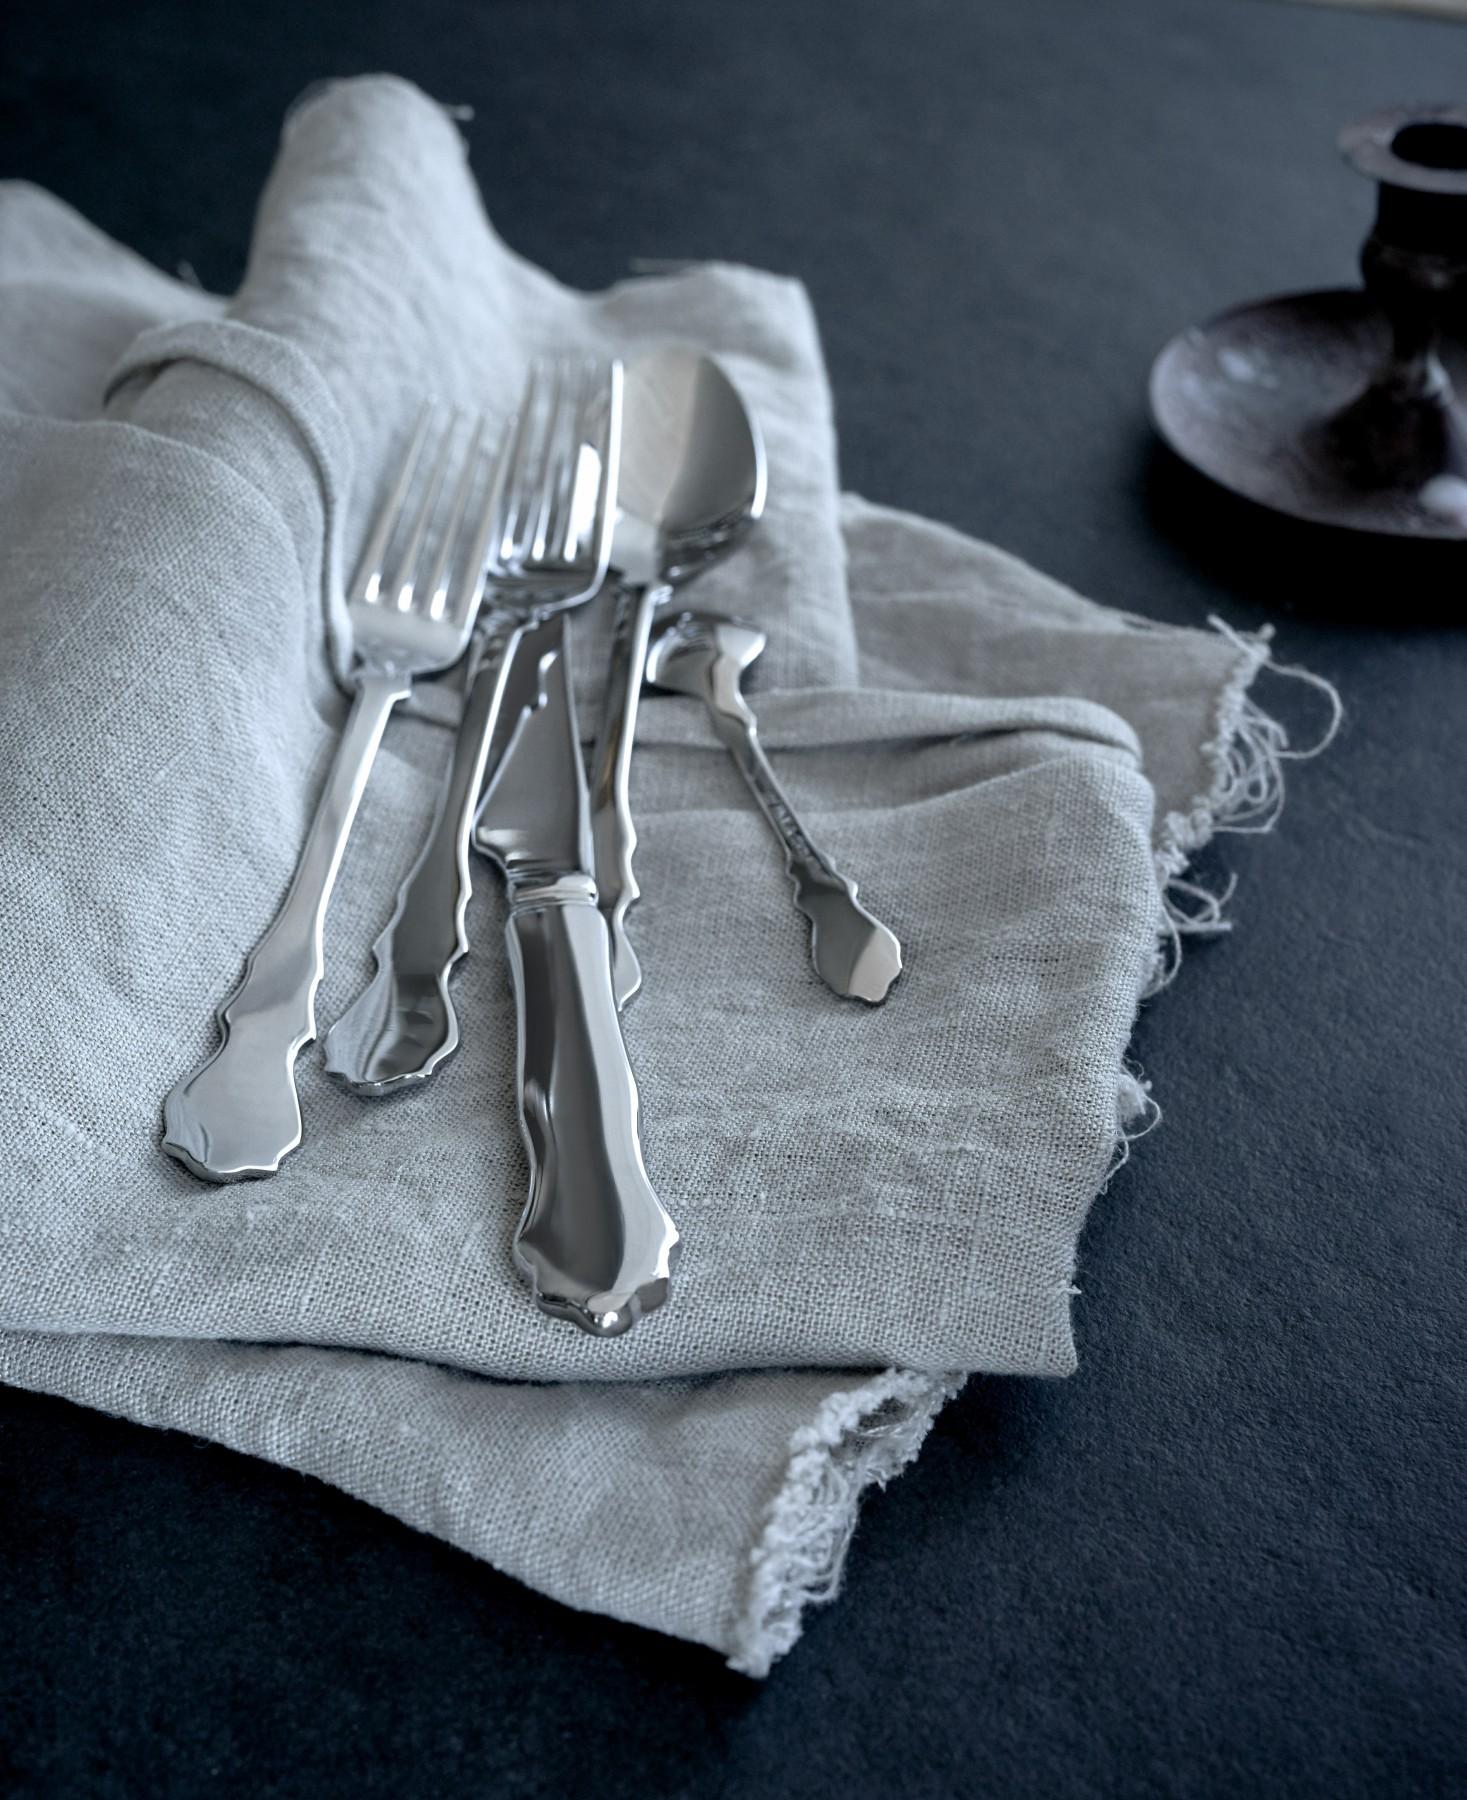 cutlery IKEA